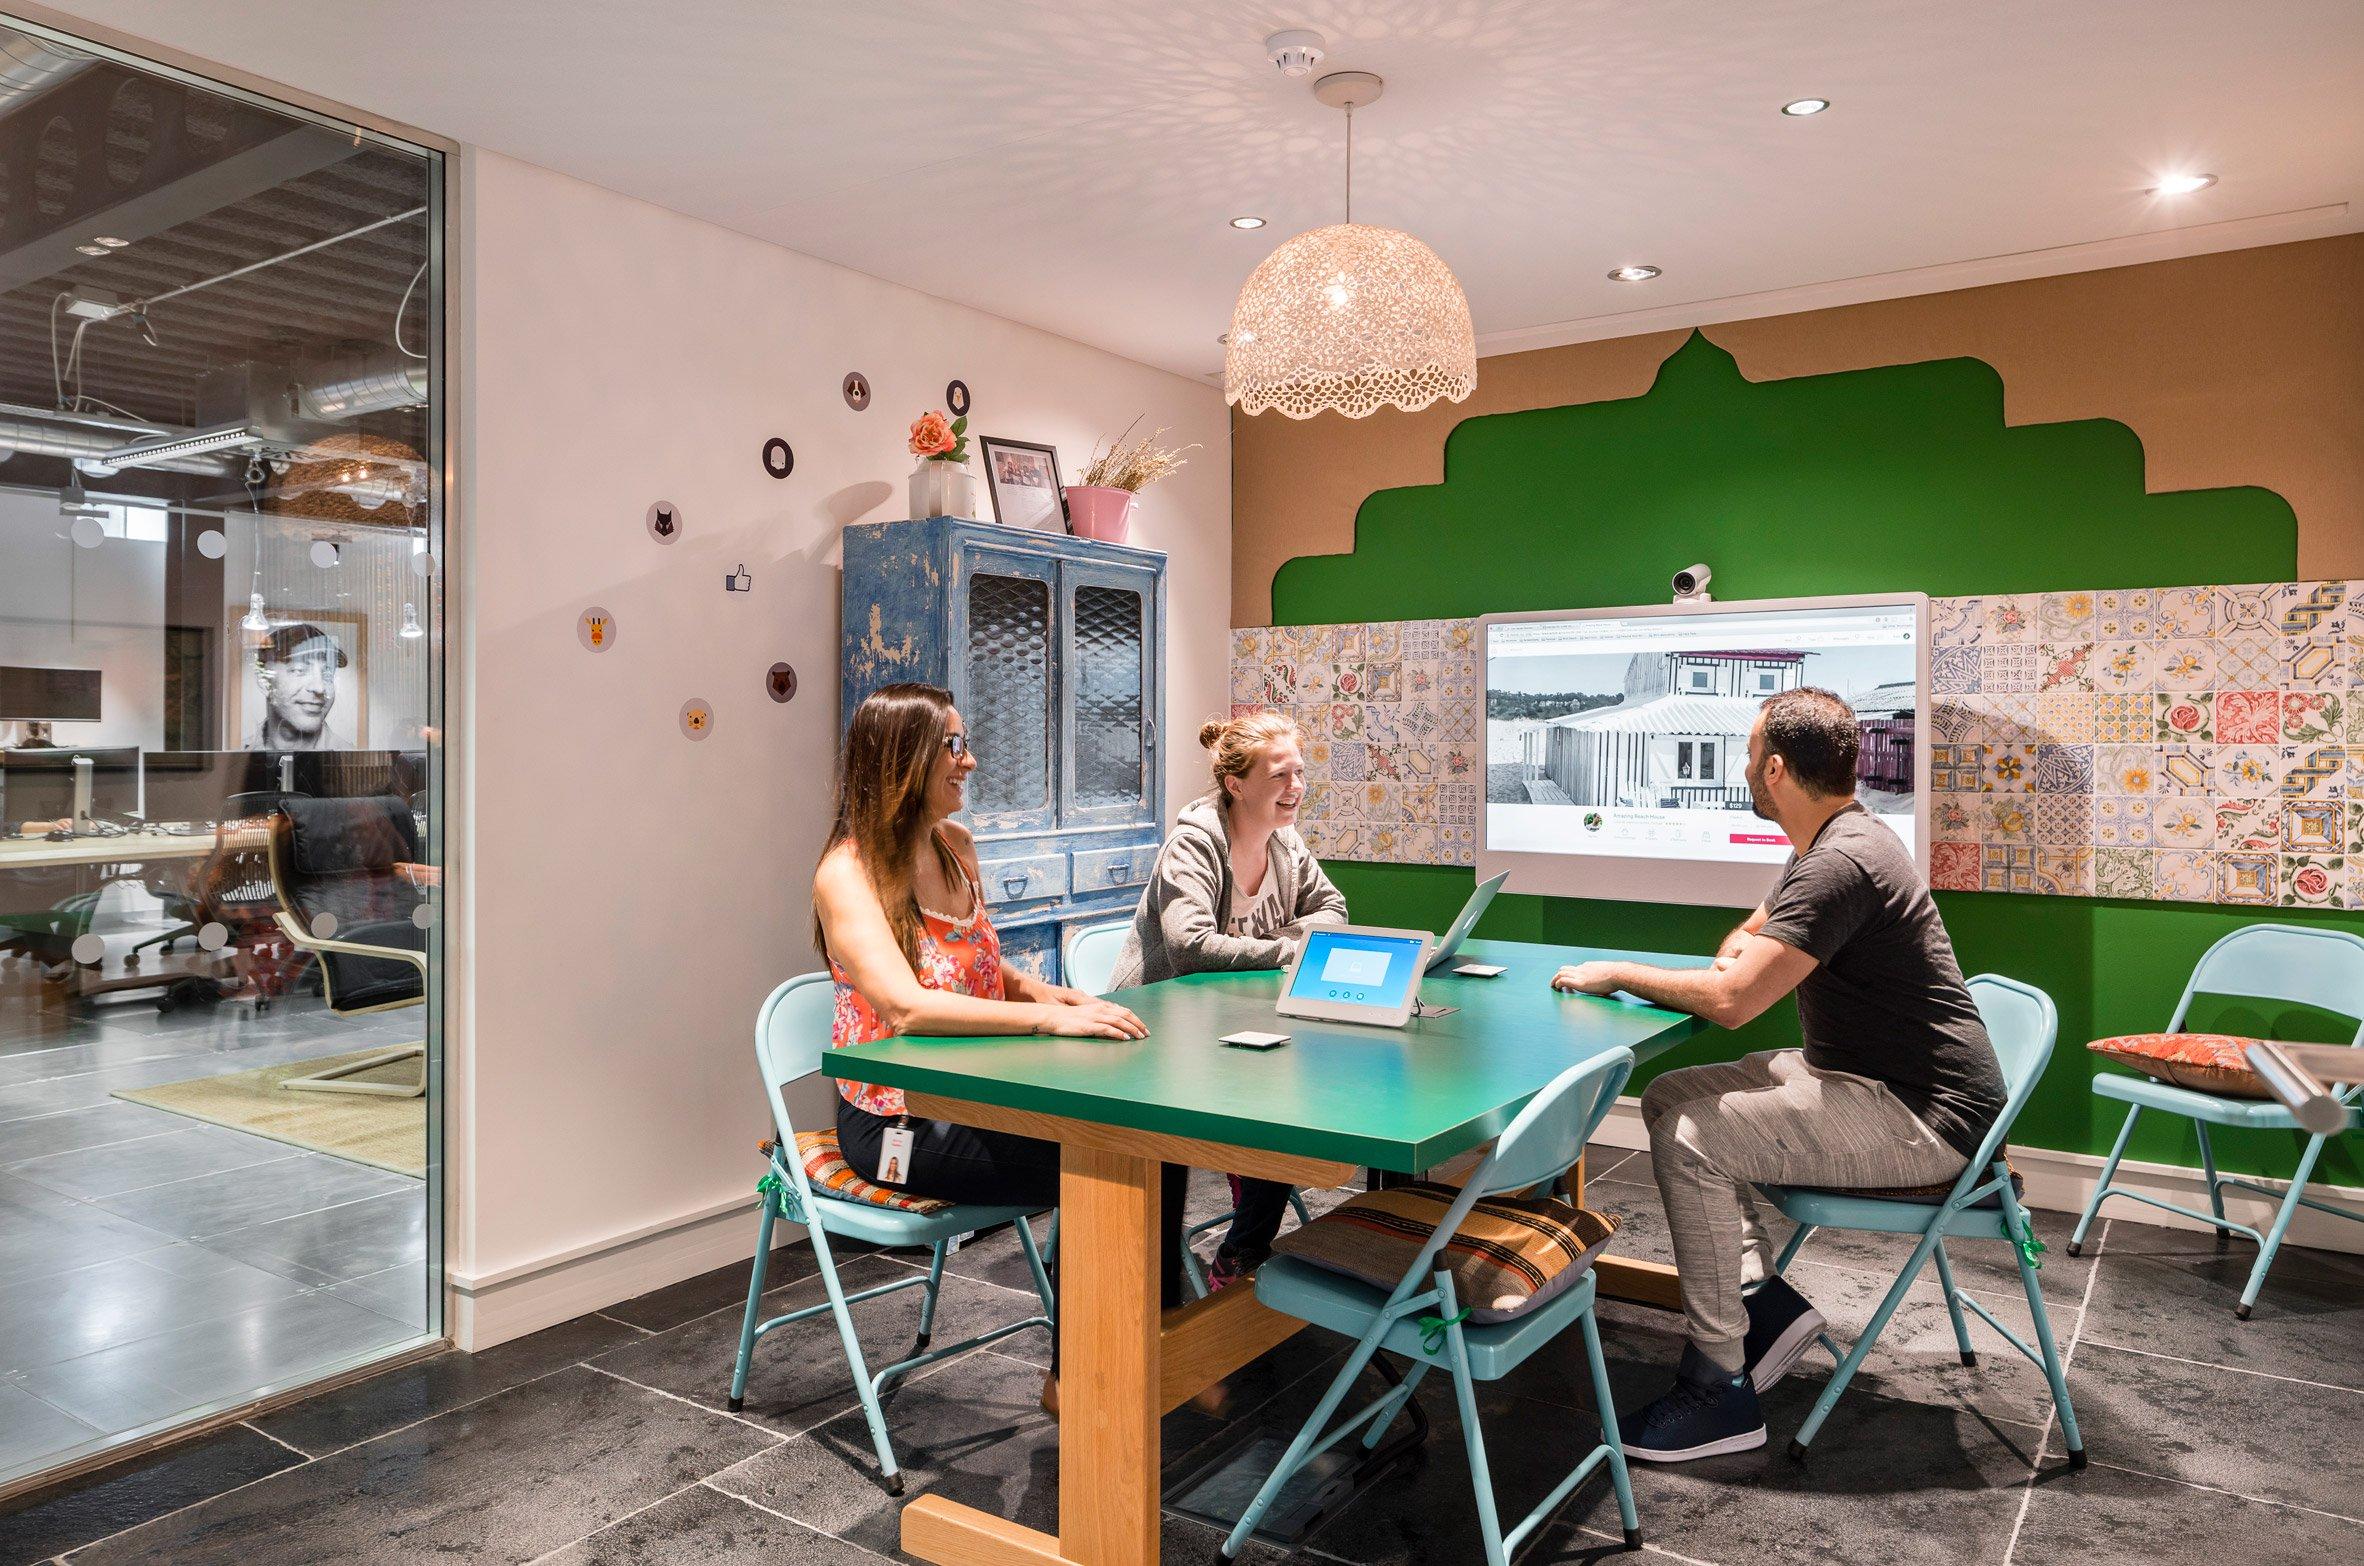 airbnb-dublin-office-interiors-ireland-offices_dezeen_2364_col_23